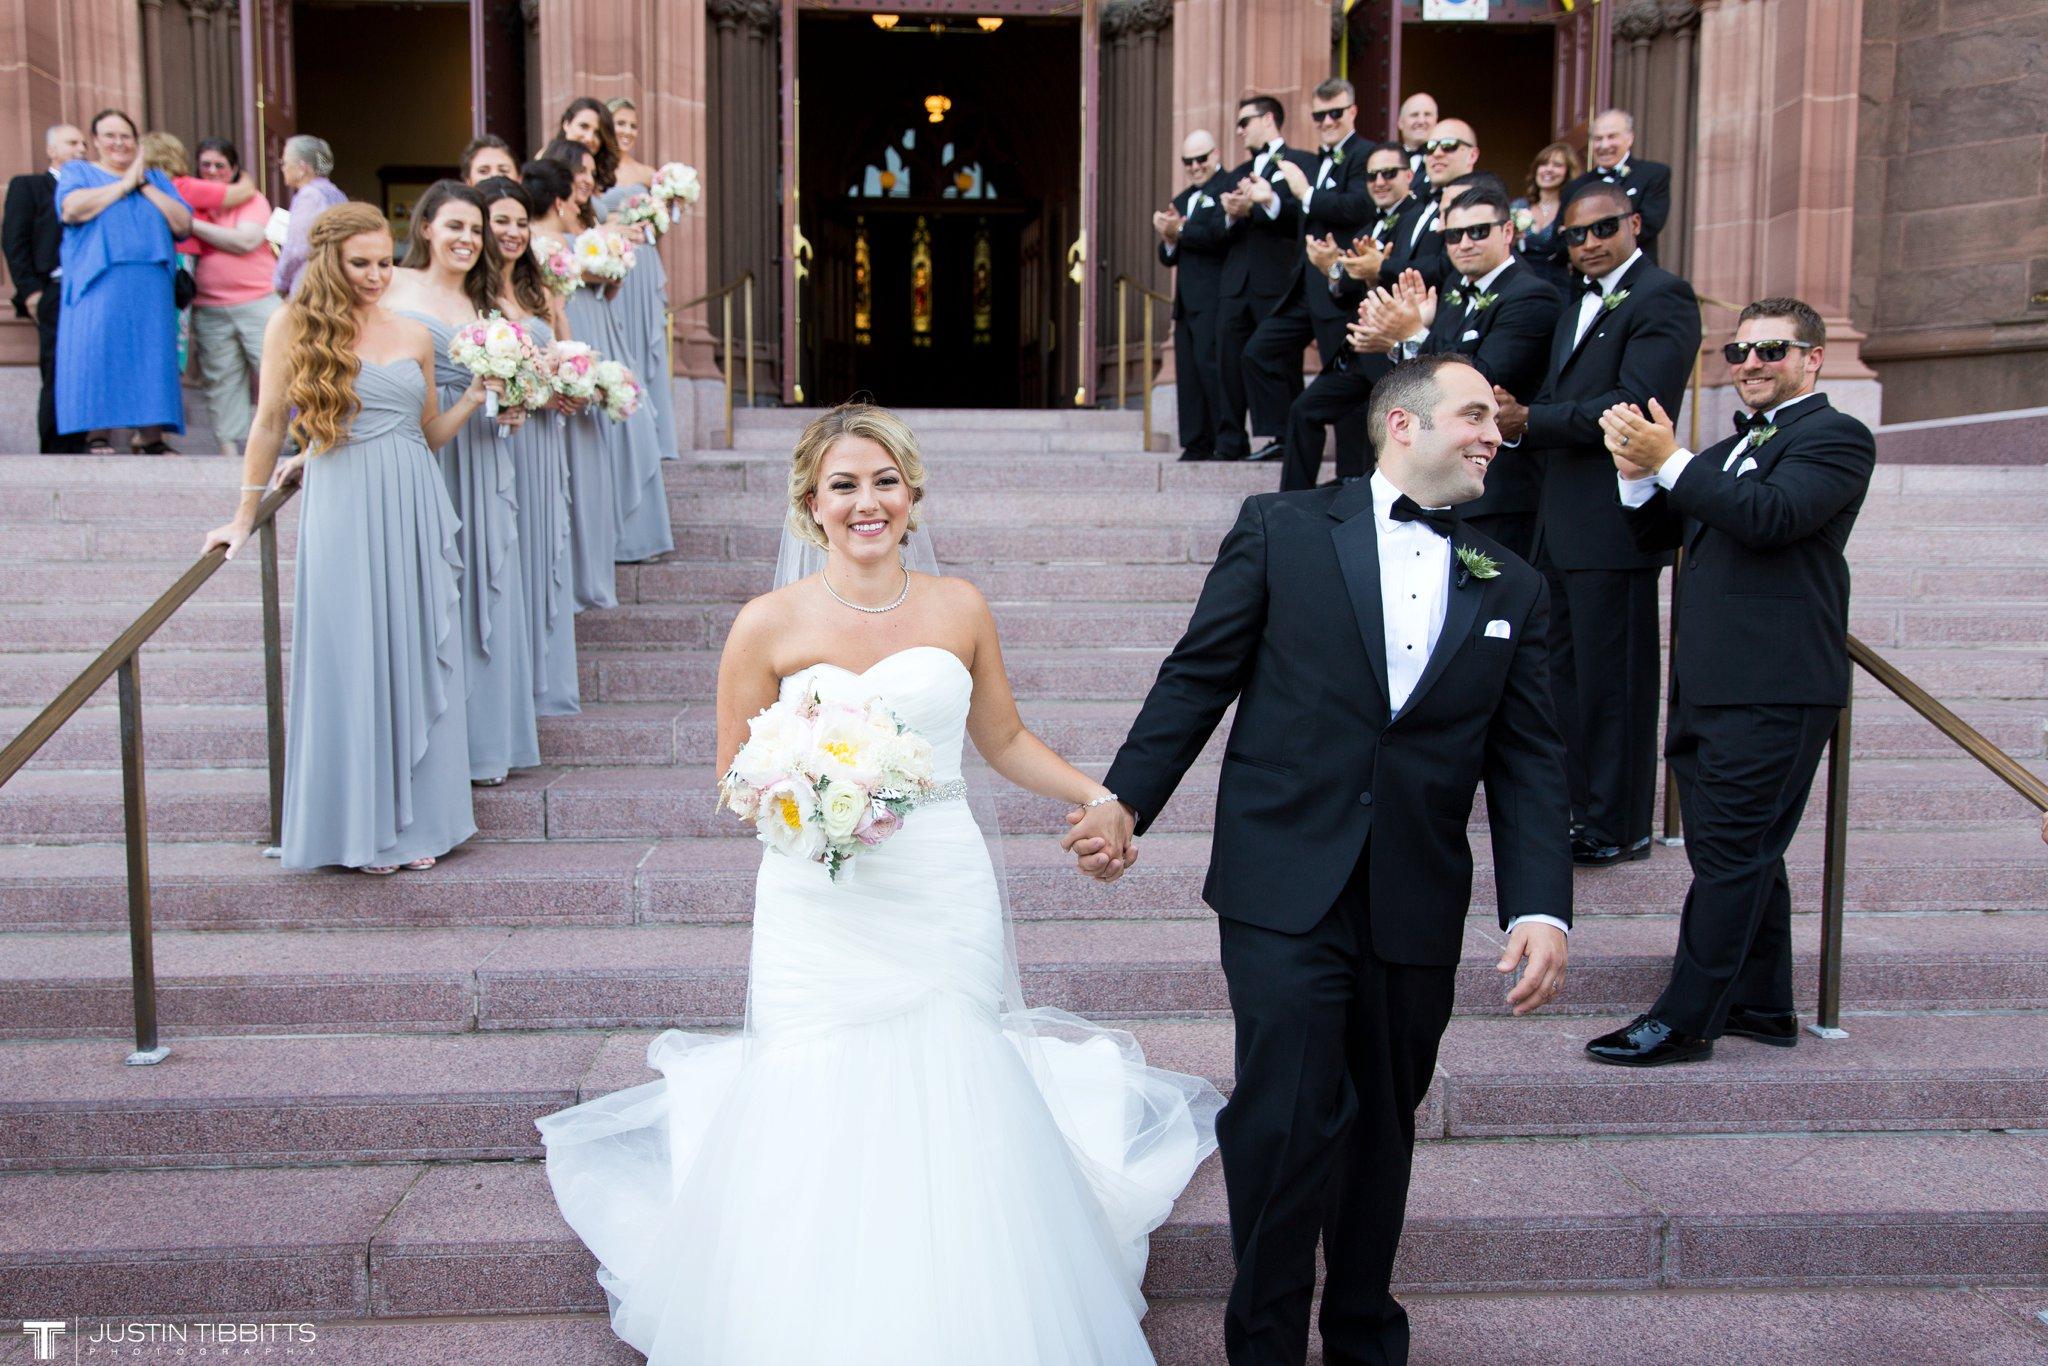 state-room-wedding-photos-with-amanda-and-nick_0103